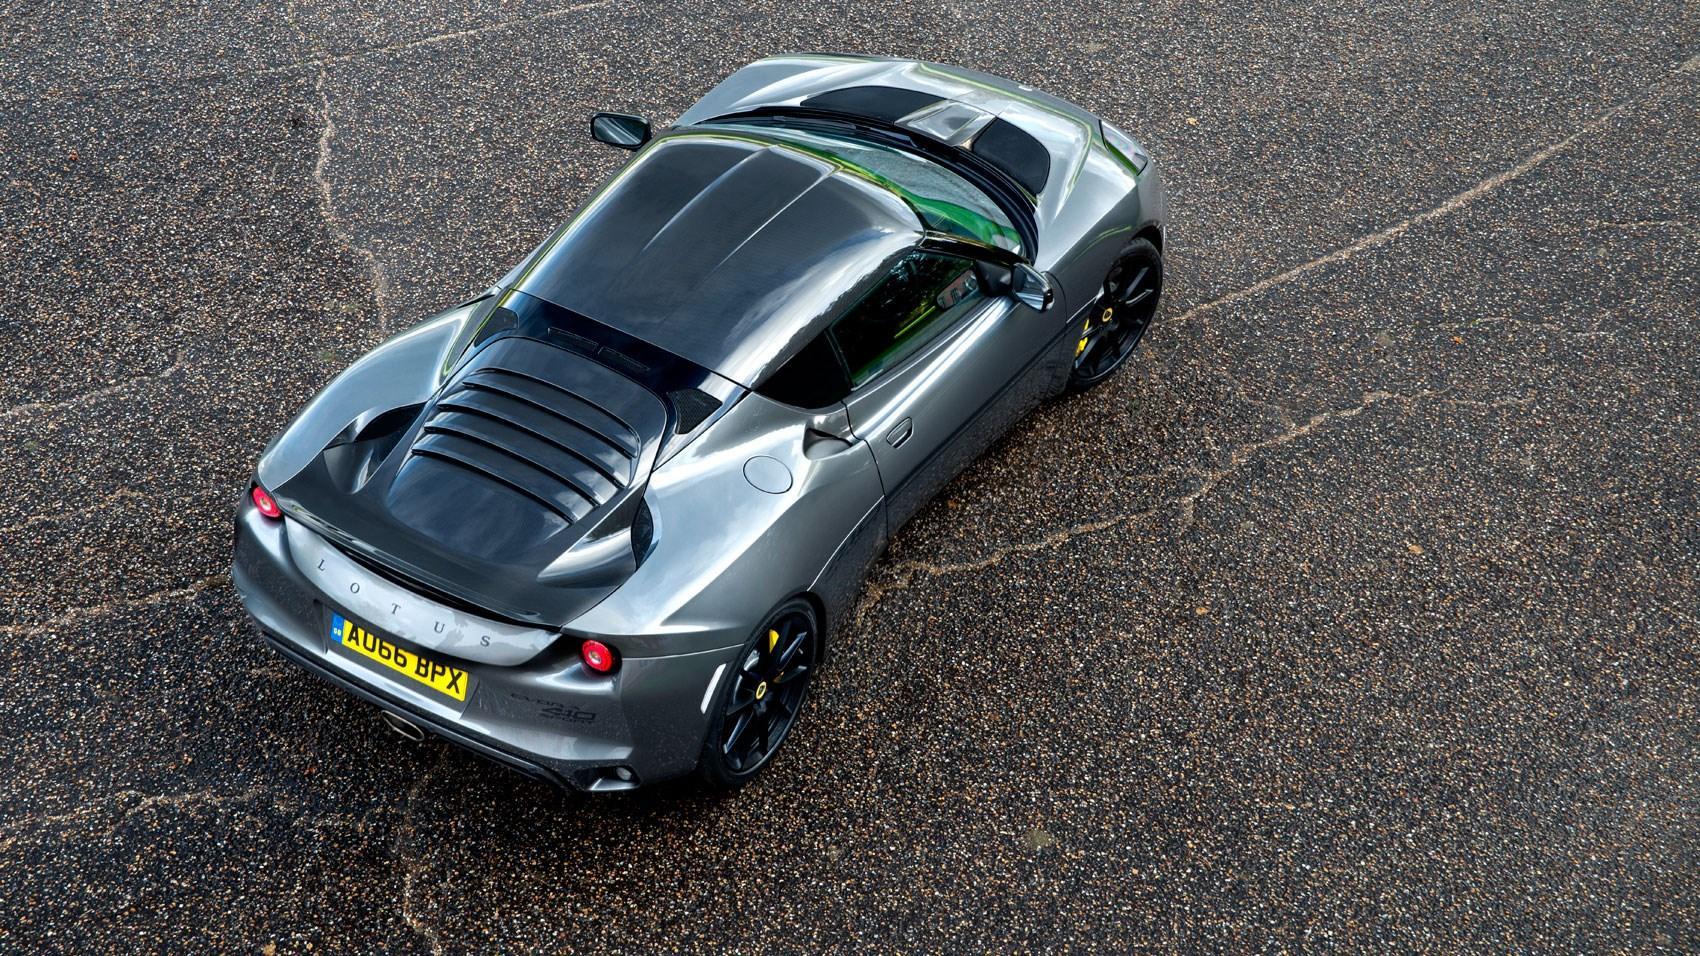 Lotus Evora Sport 410 Laptimes Specs Performance Data